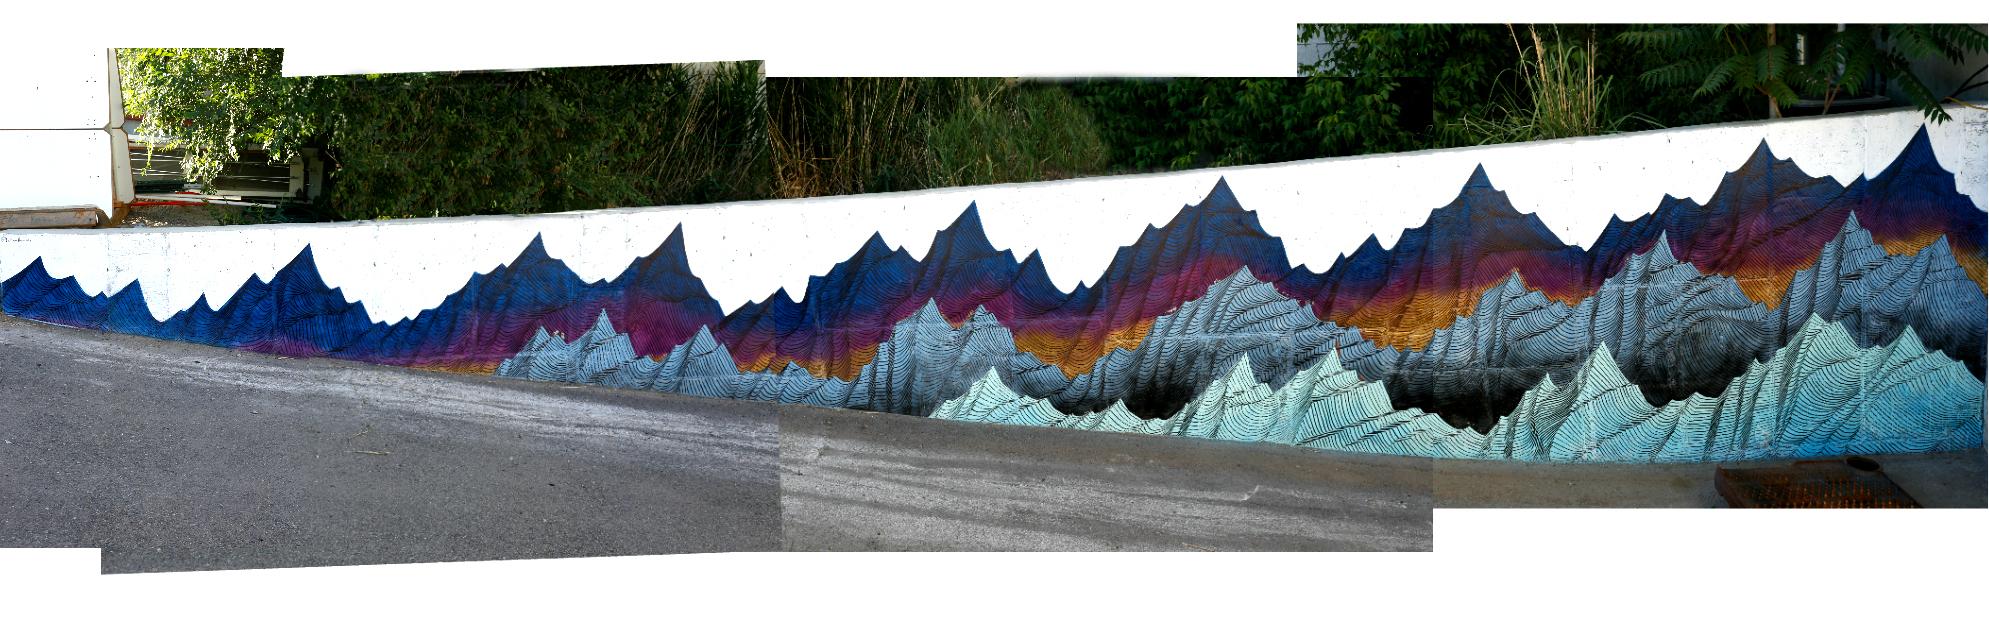 ProLab Mural1.jpg